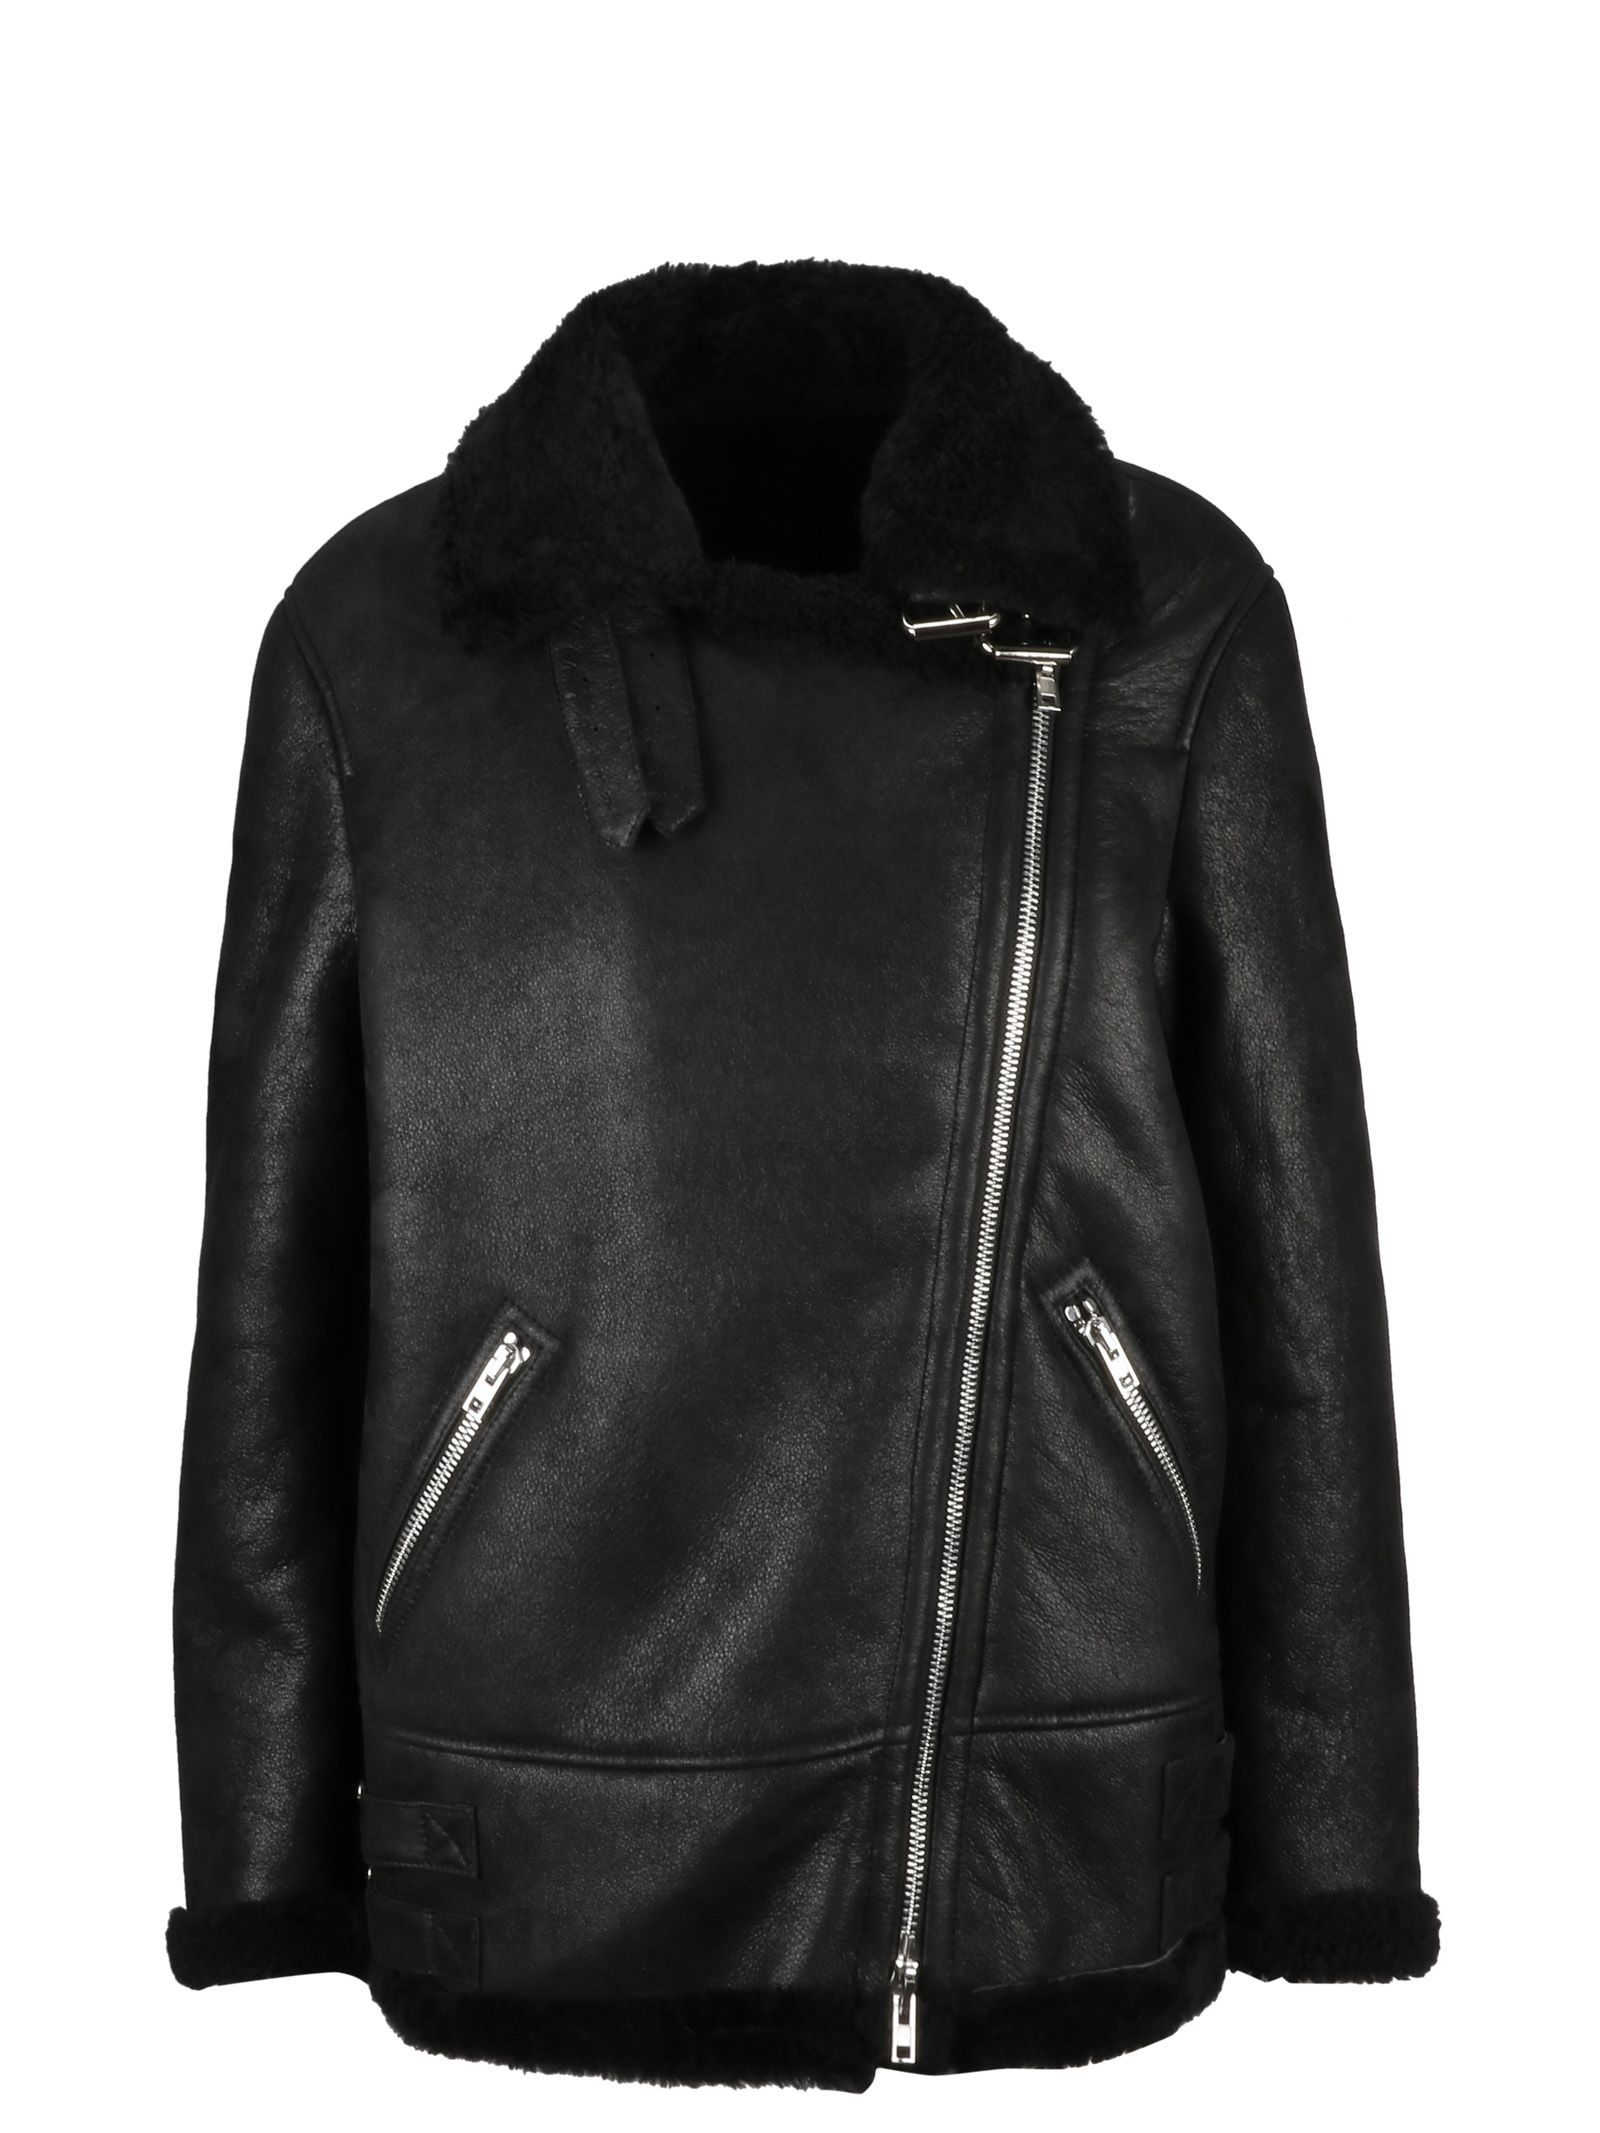 s.w.o.r.d 6.6.44 - S.w.o.r.d 6.6.4.4. Zipped Fur Jacket